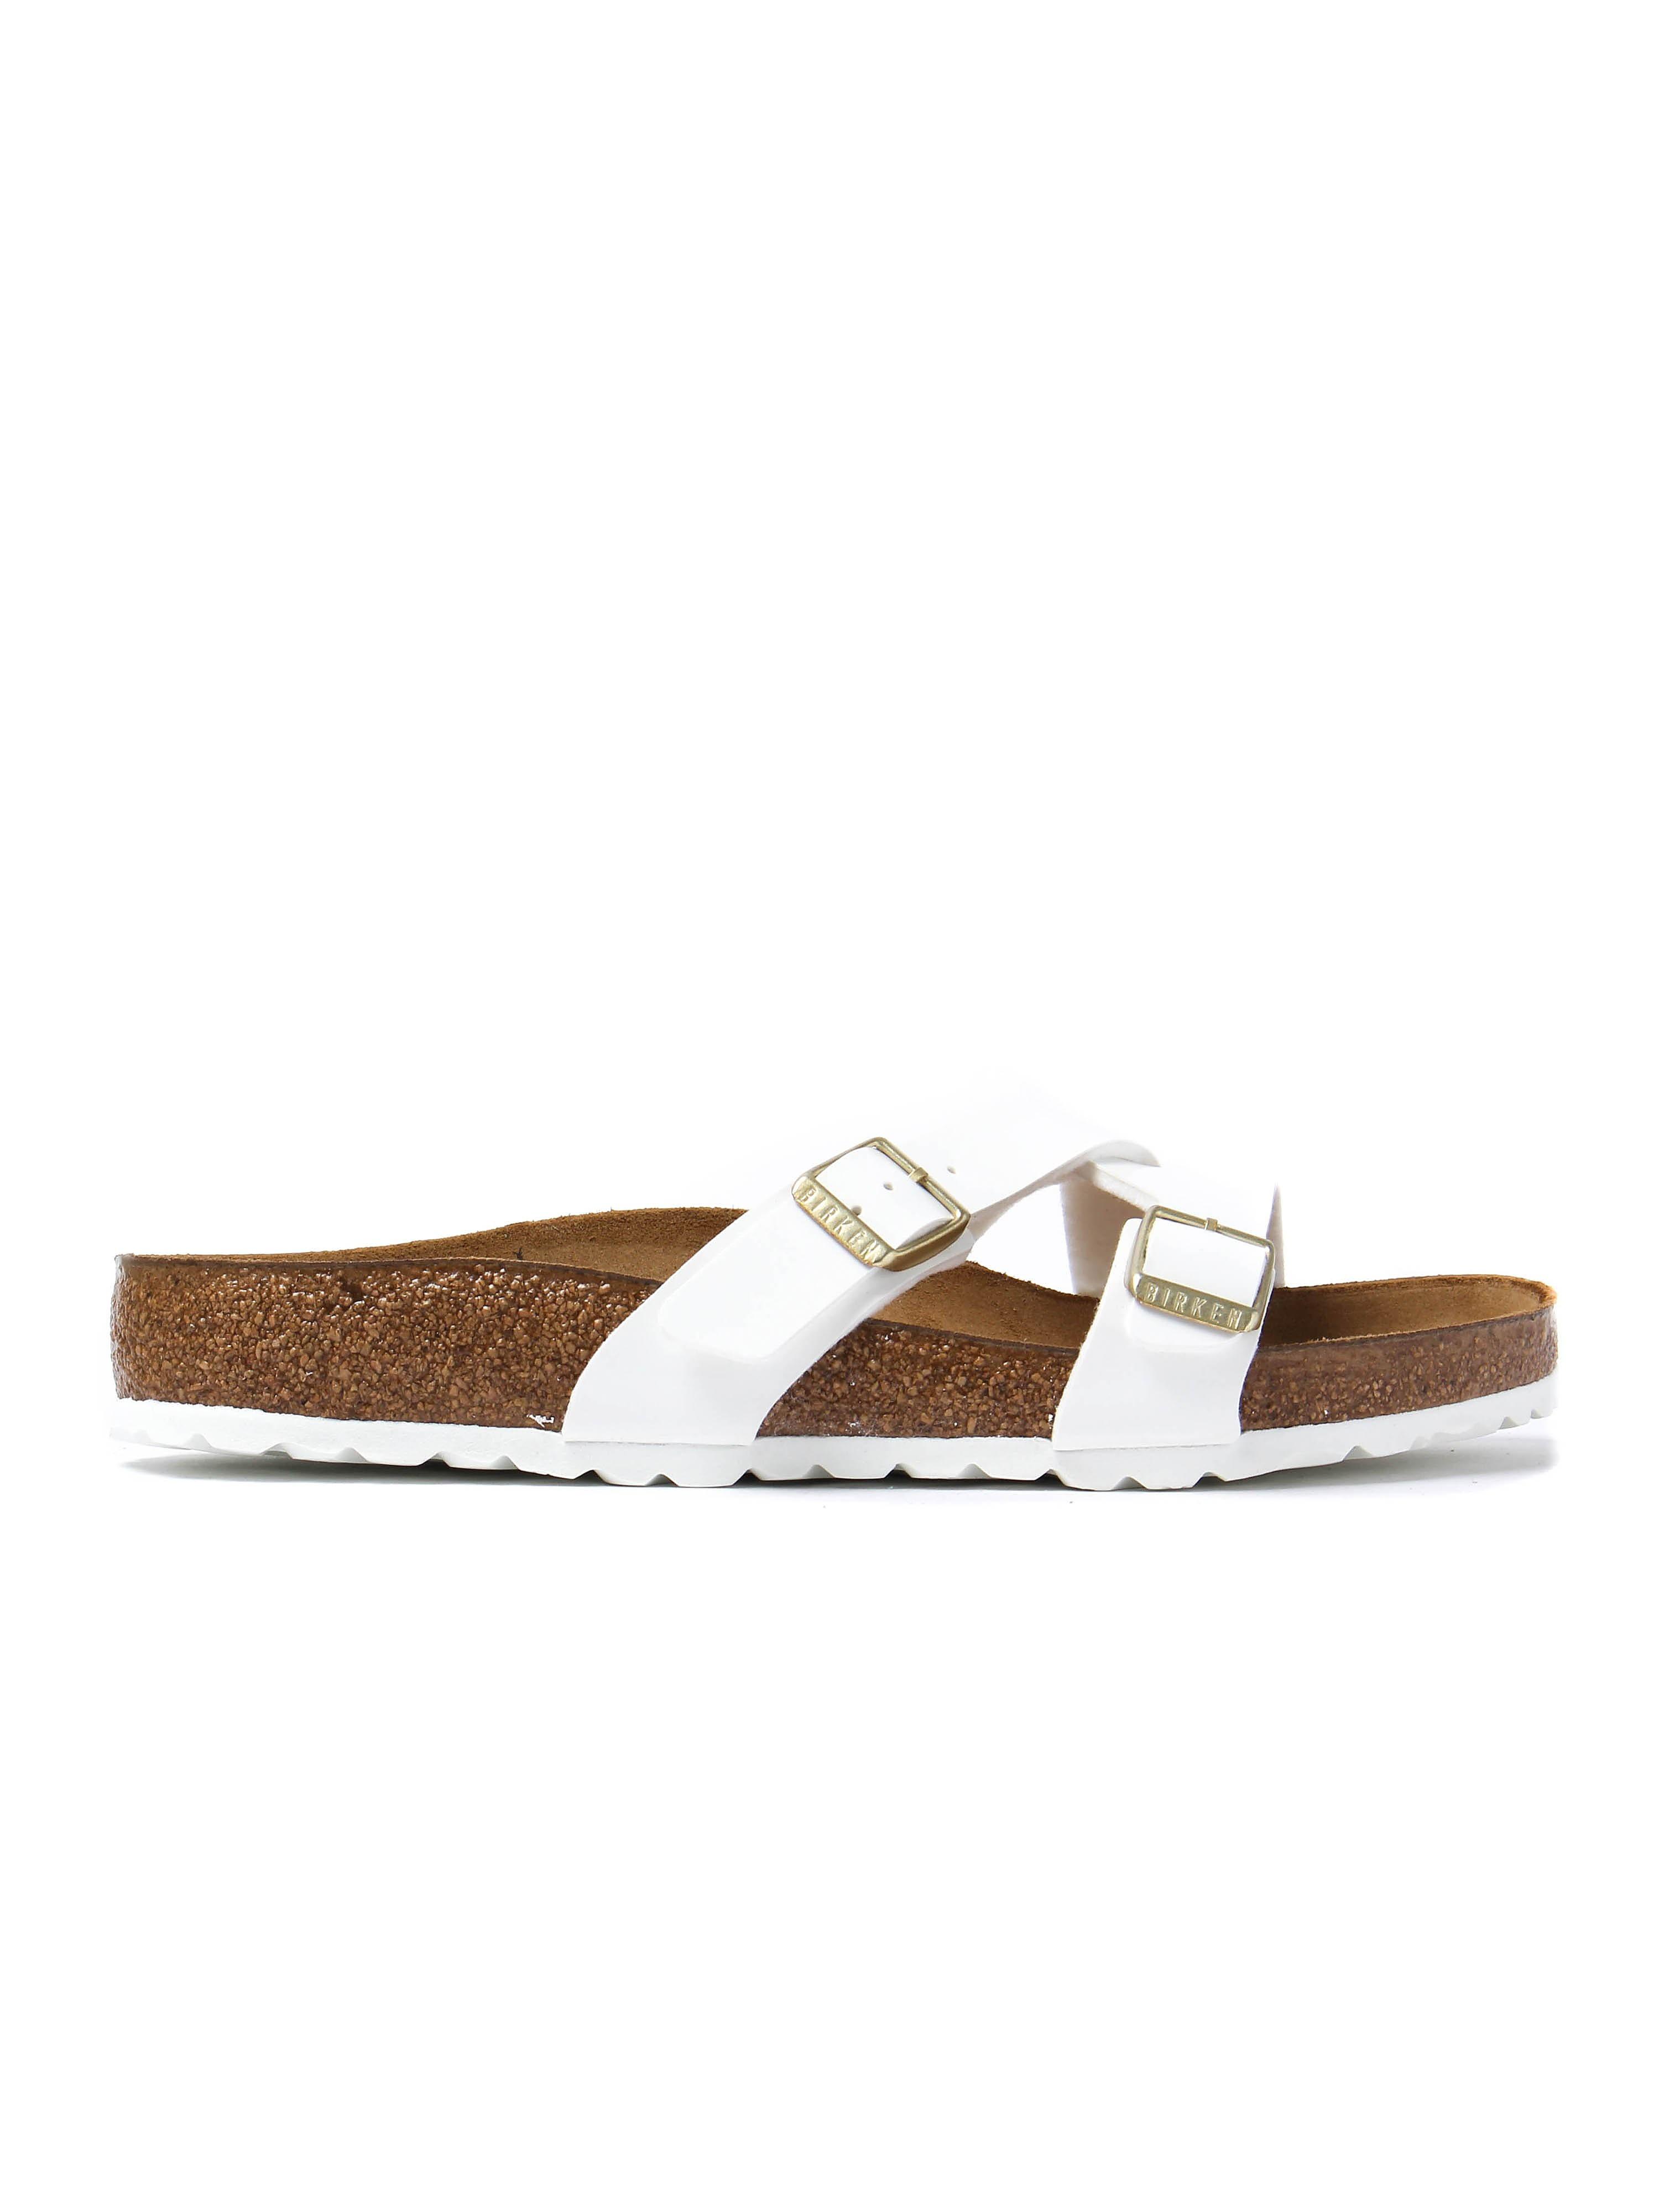 Birkenstock Women's Yao Balance Regular Fit Sandals - White Patent Leather